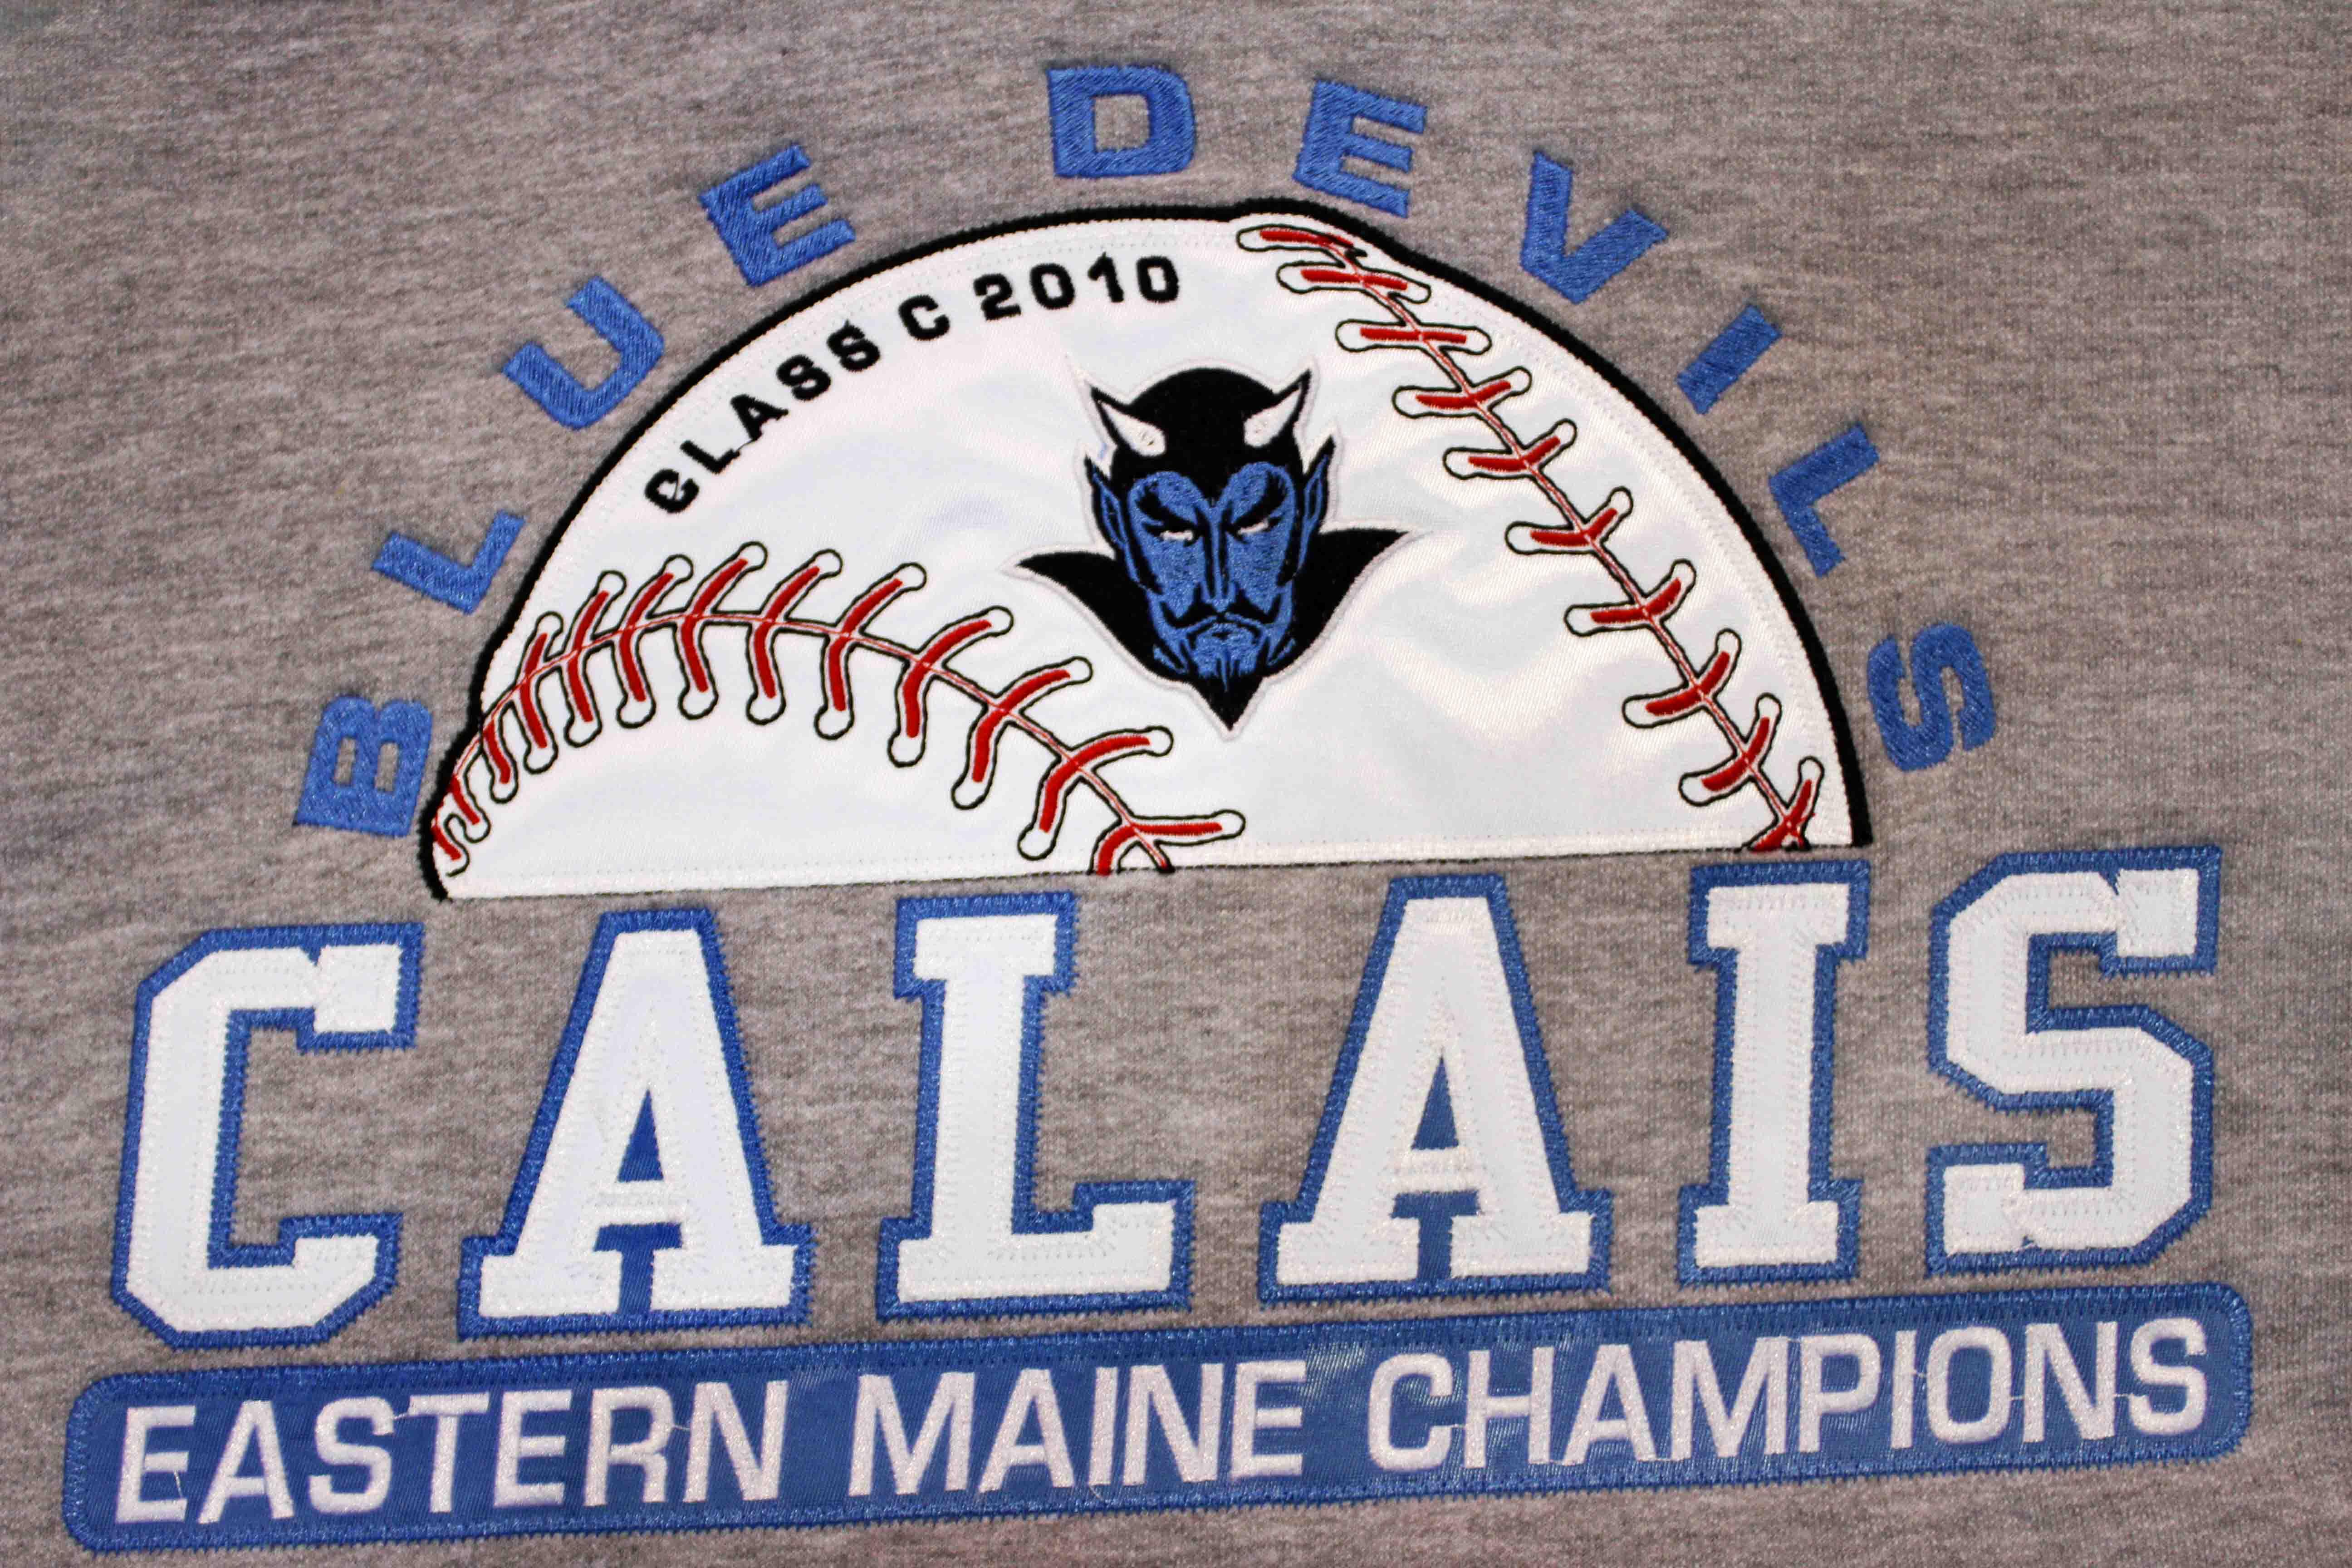 Calais Eastern Maine Champions